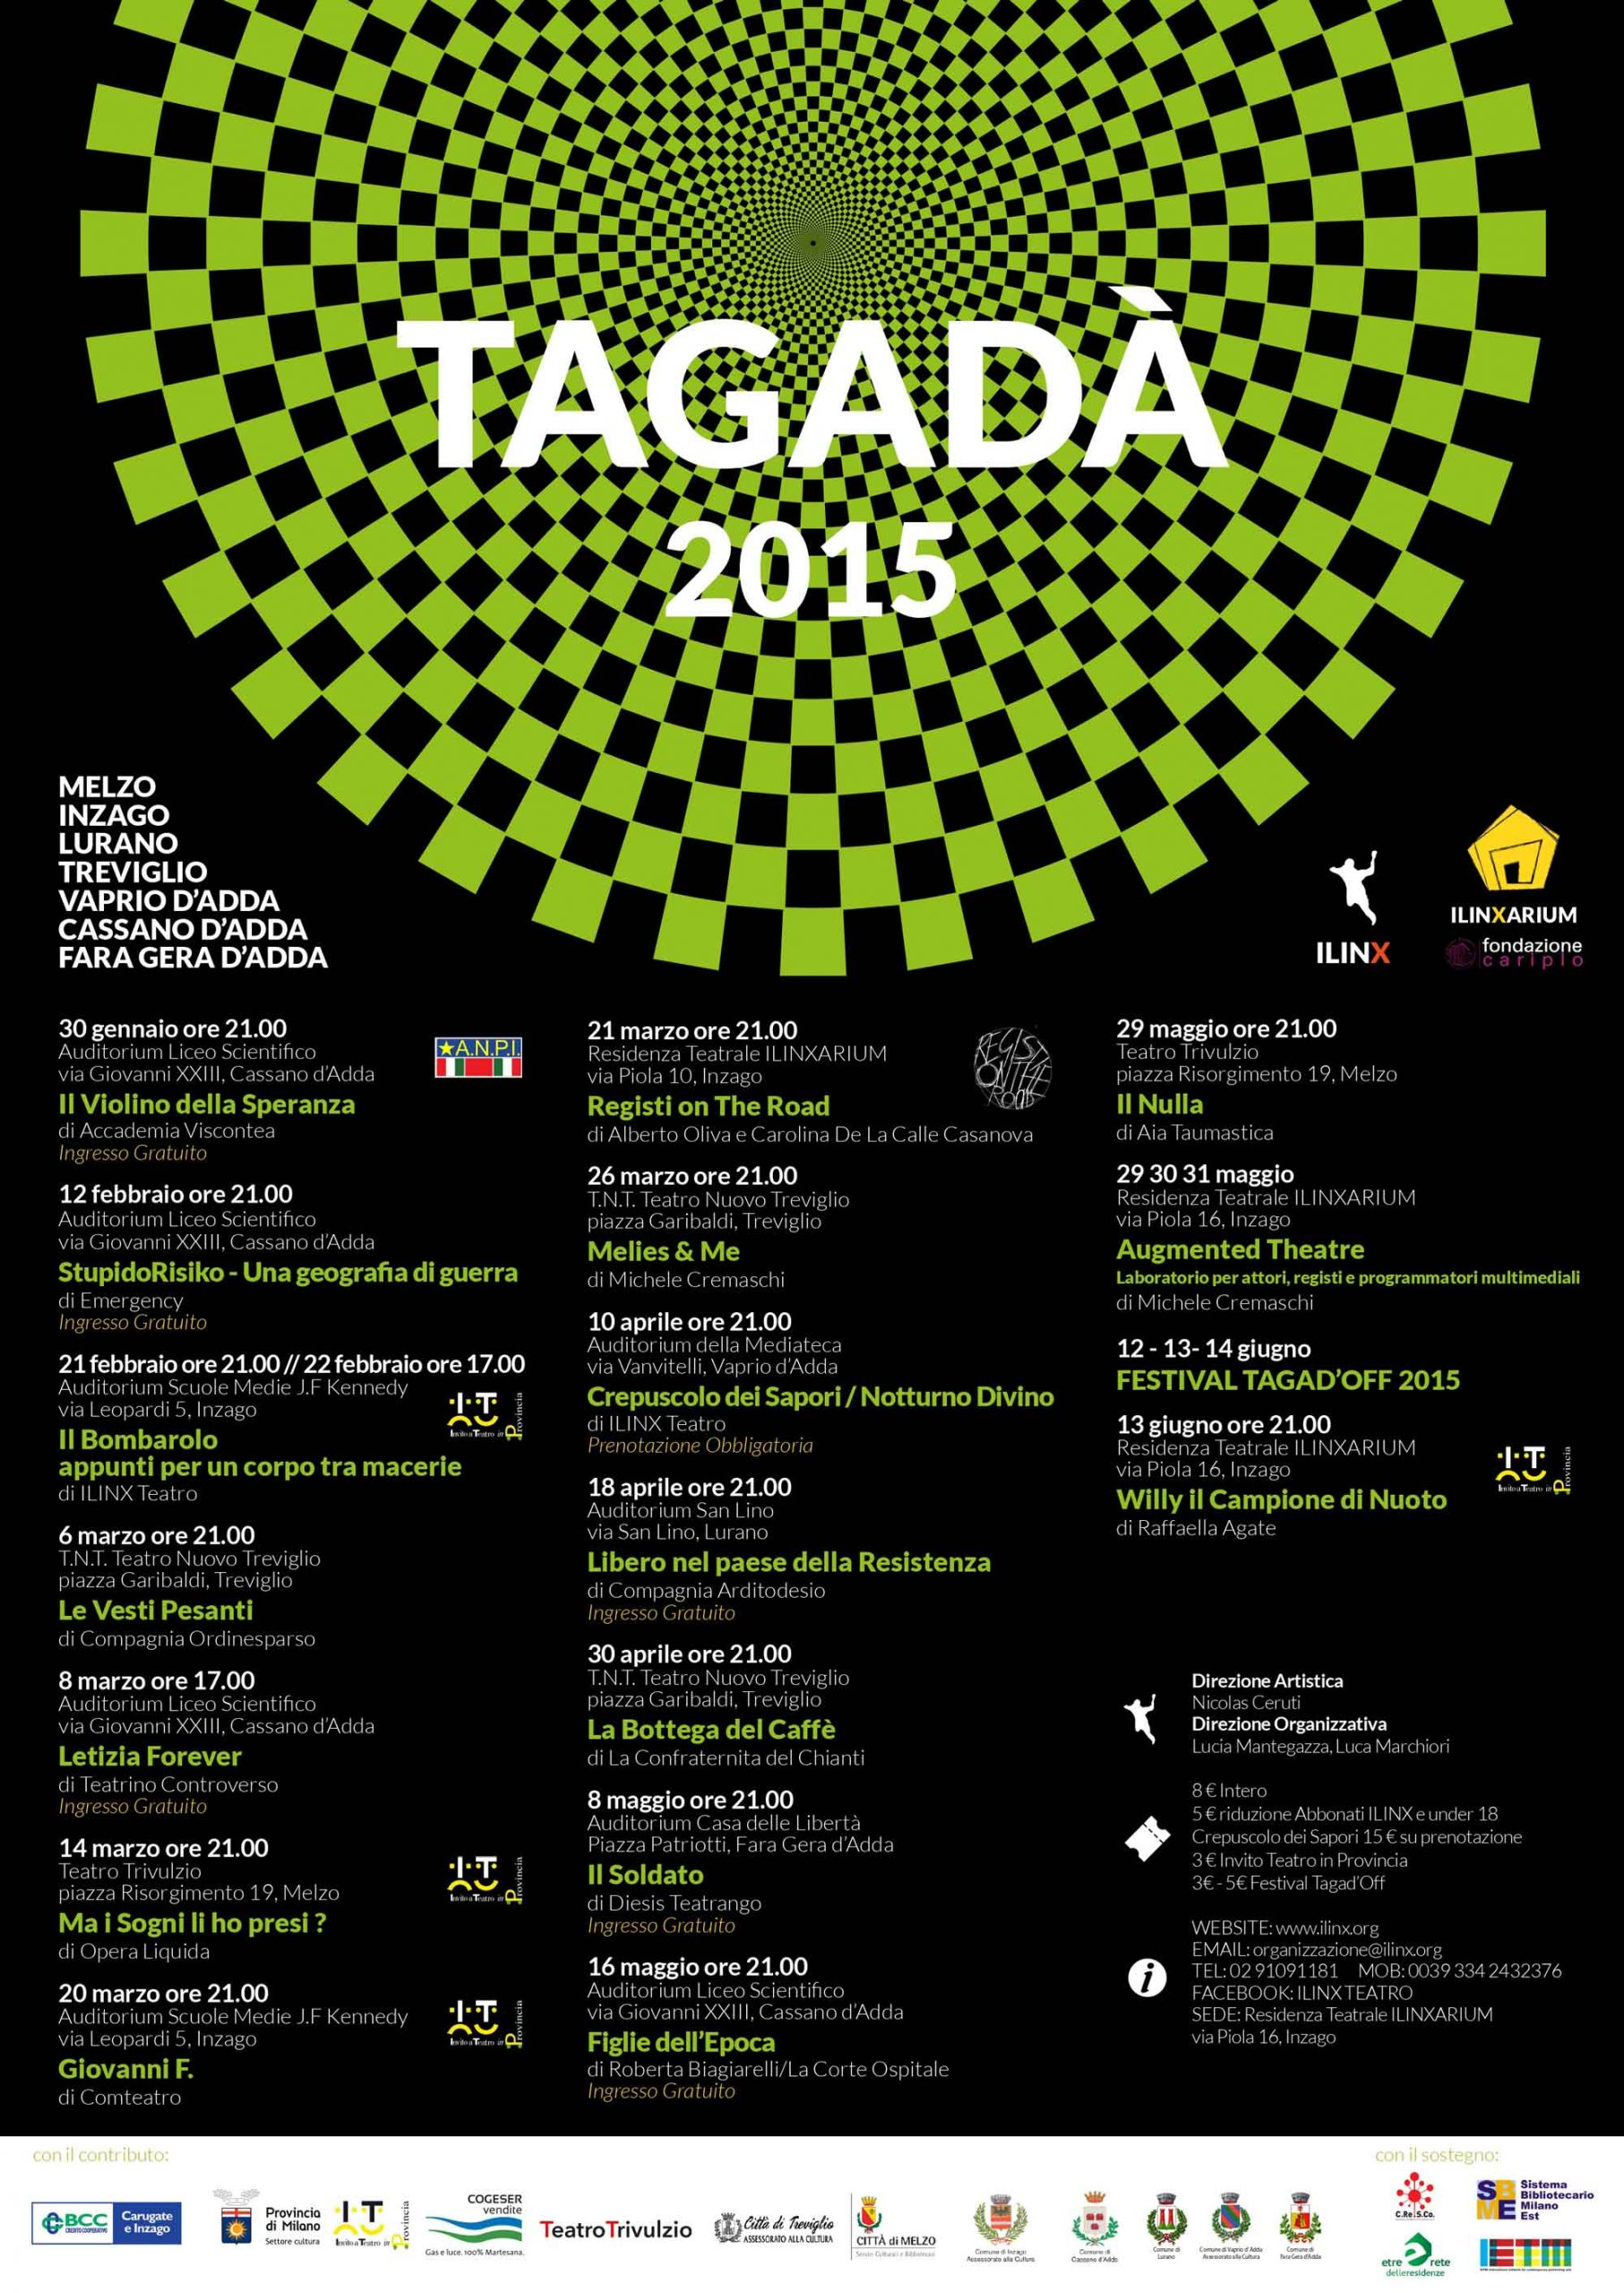 tagada_2015